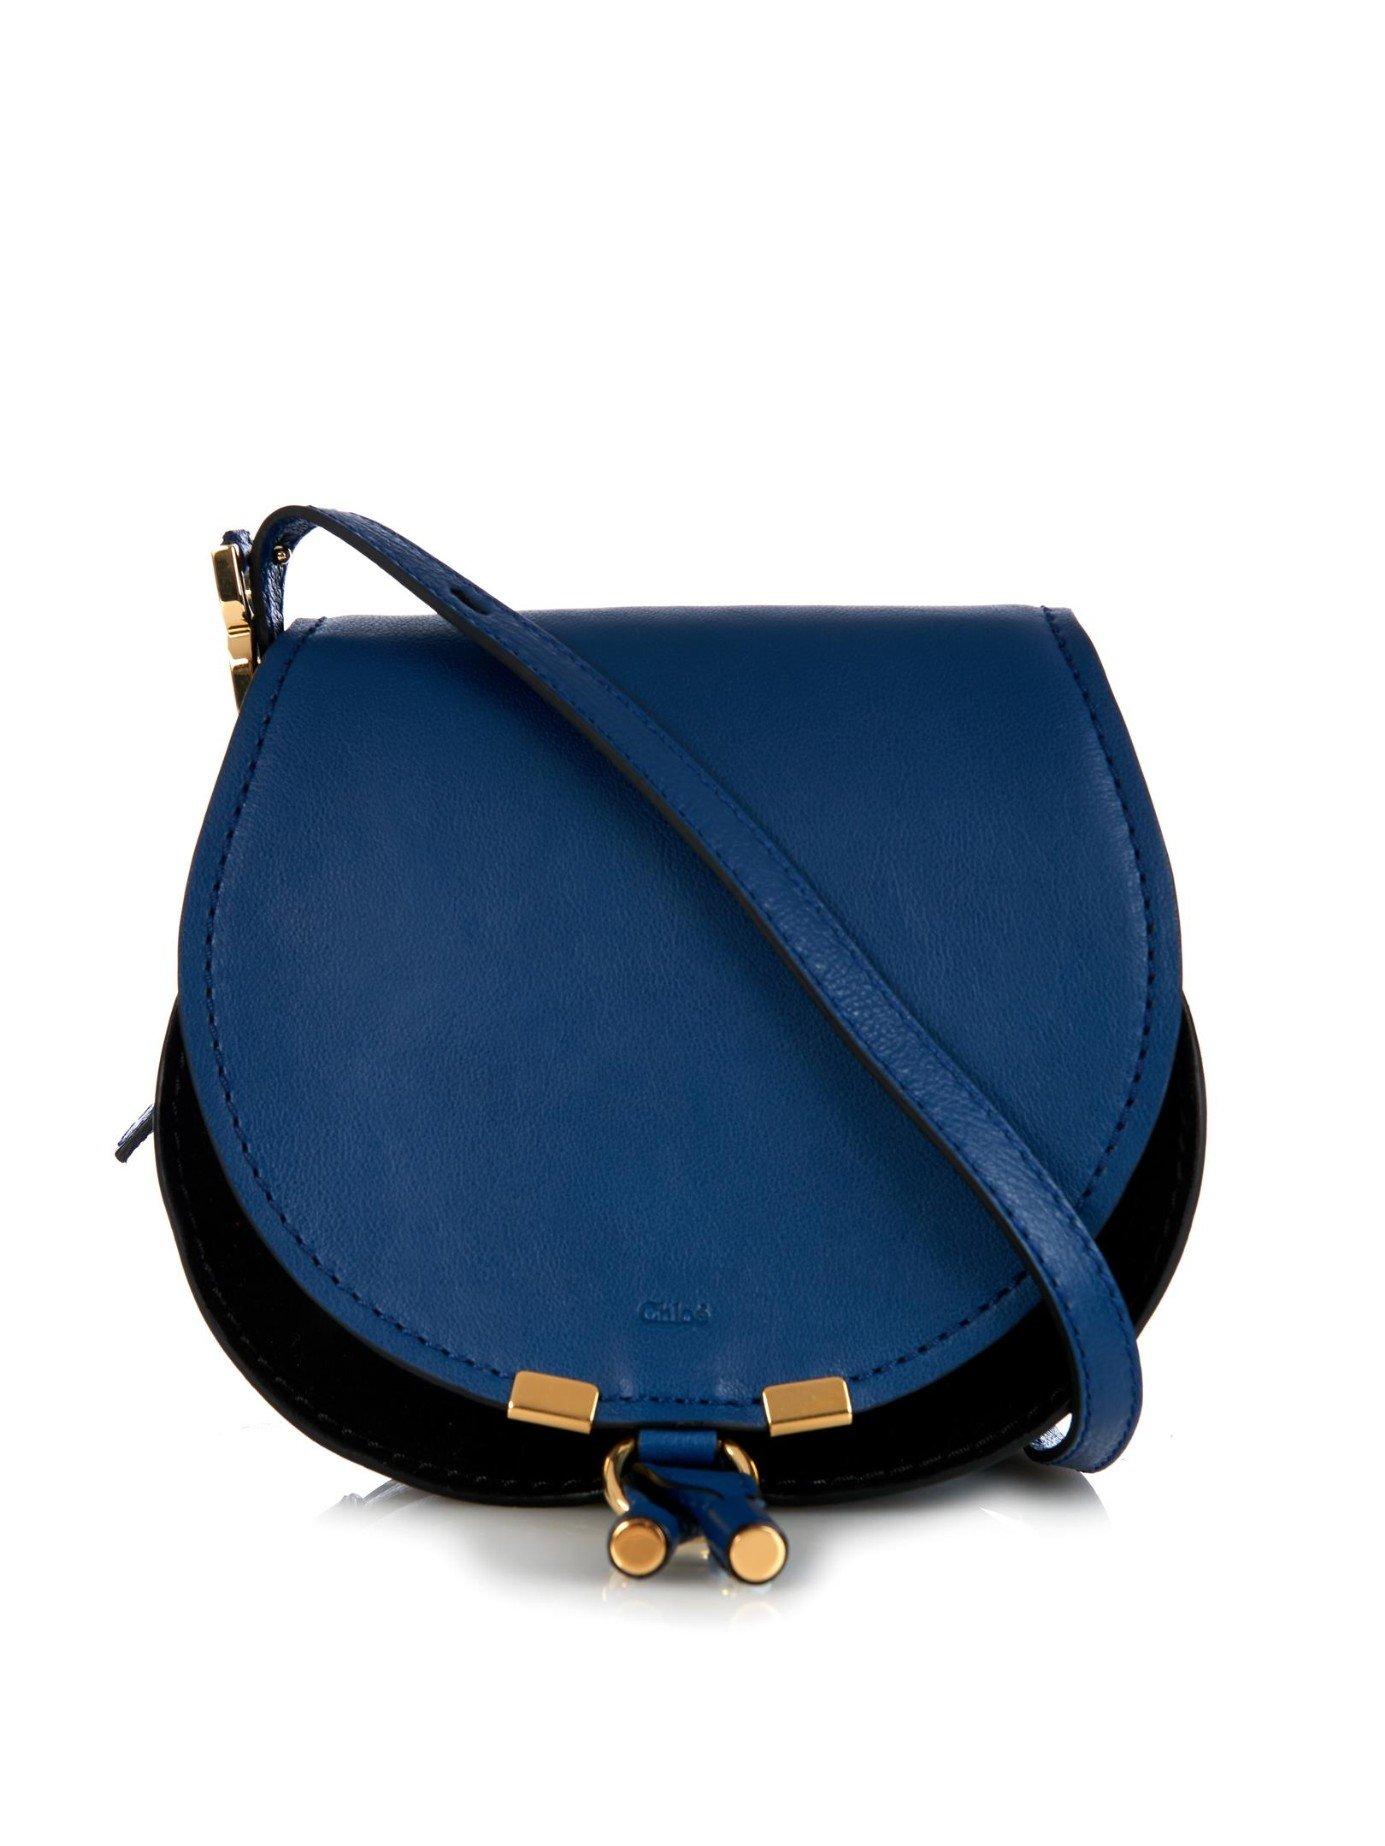 Chlo Marcie Nude Small Cross-Body Bag In Blue  Lyst-6984